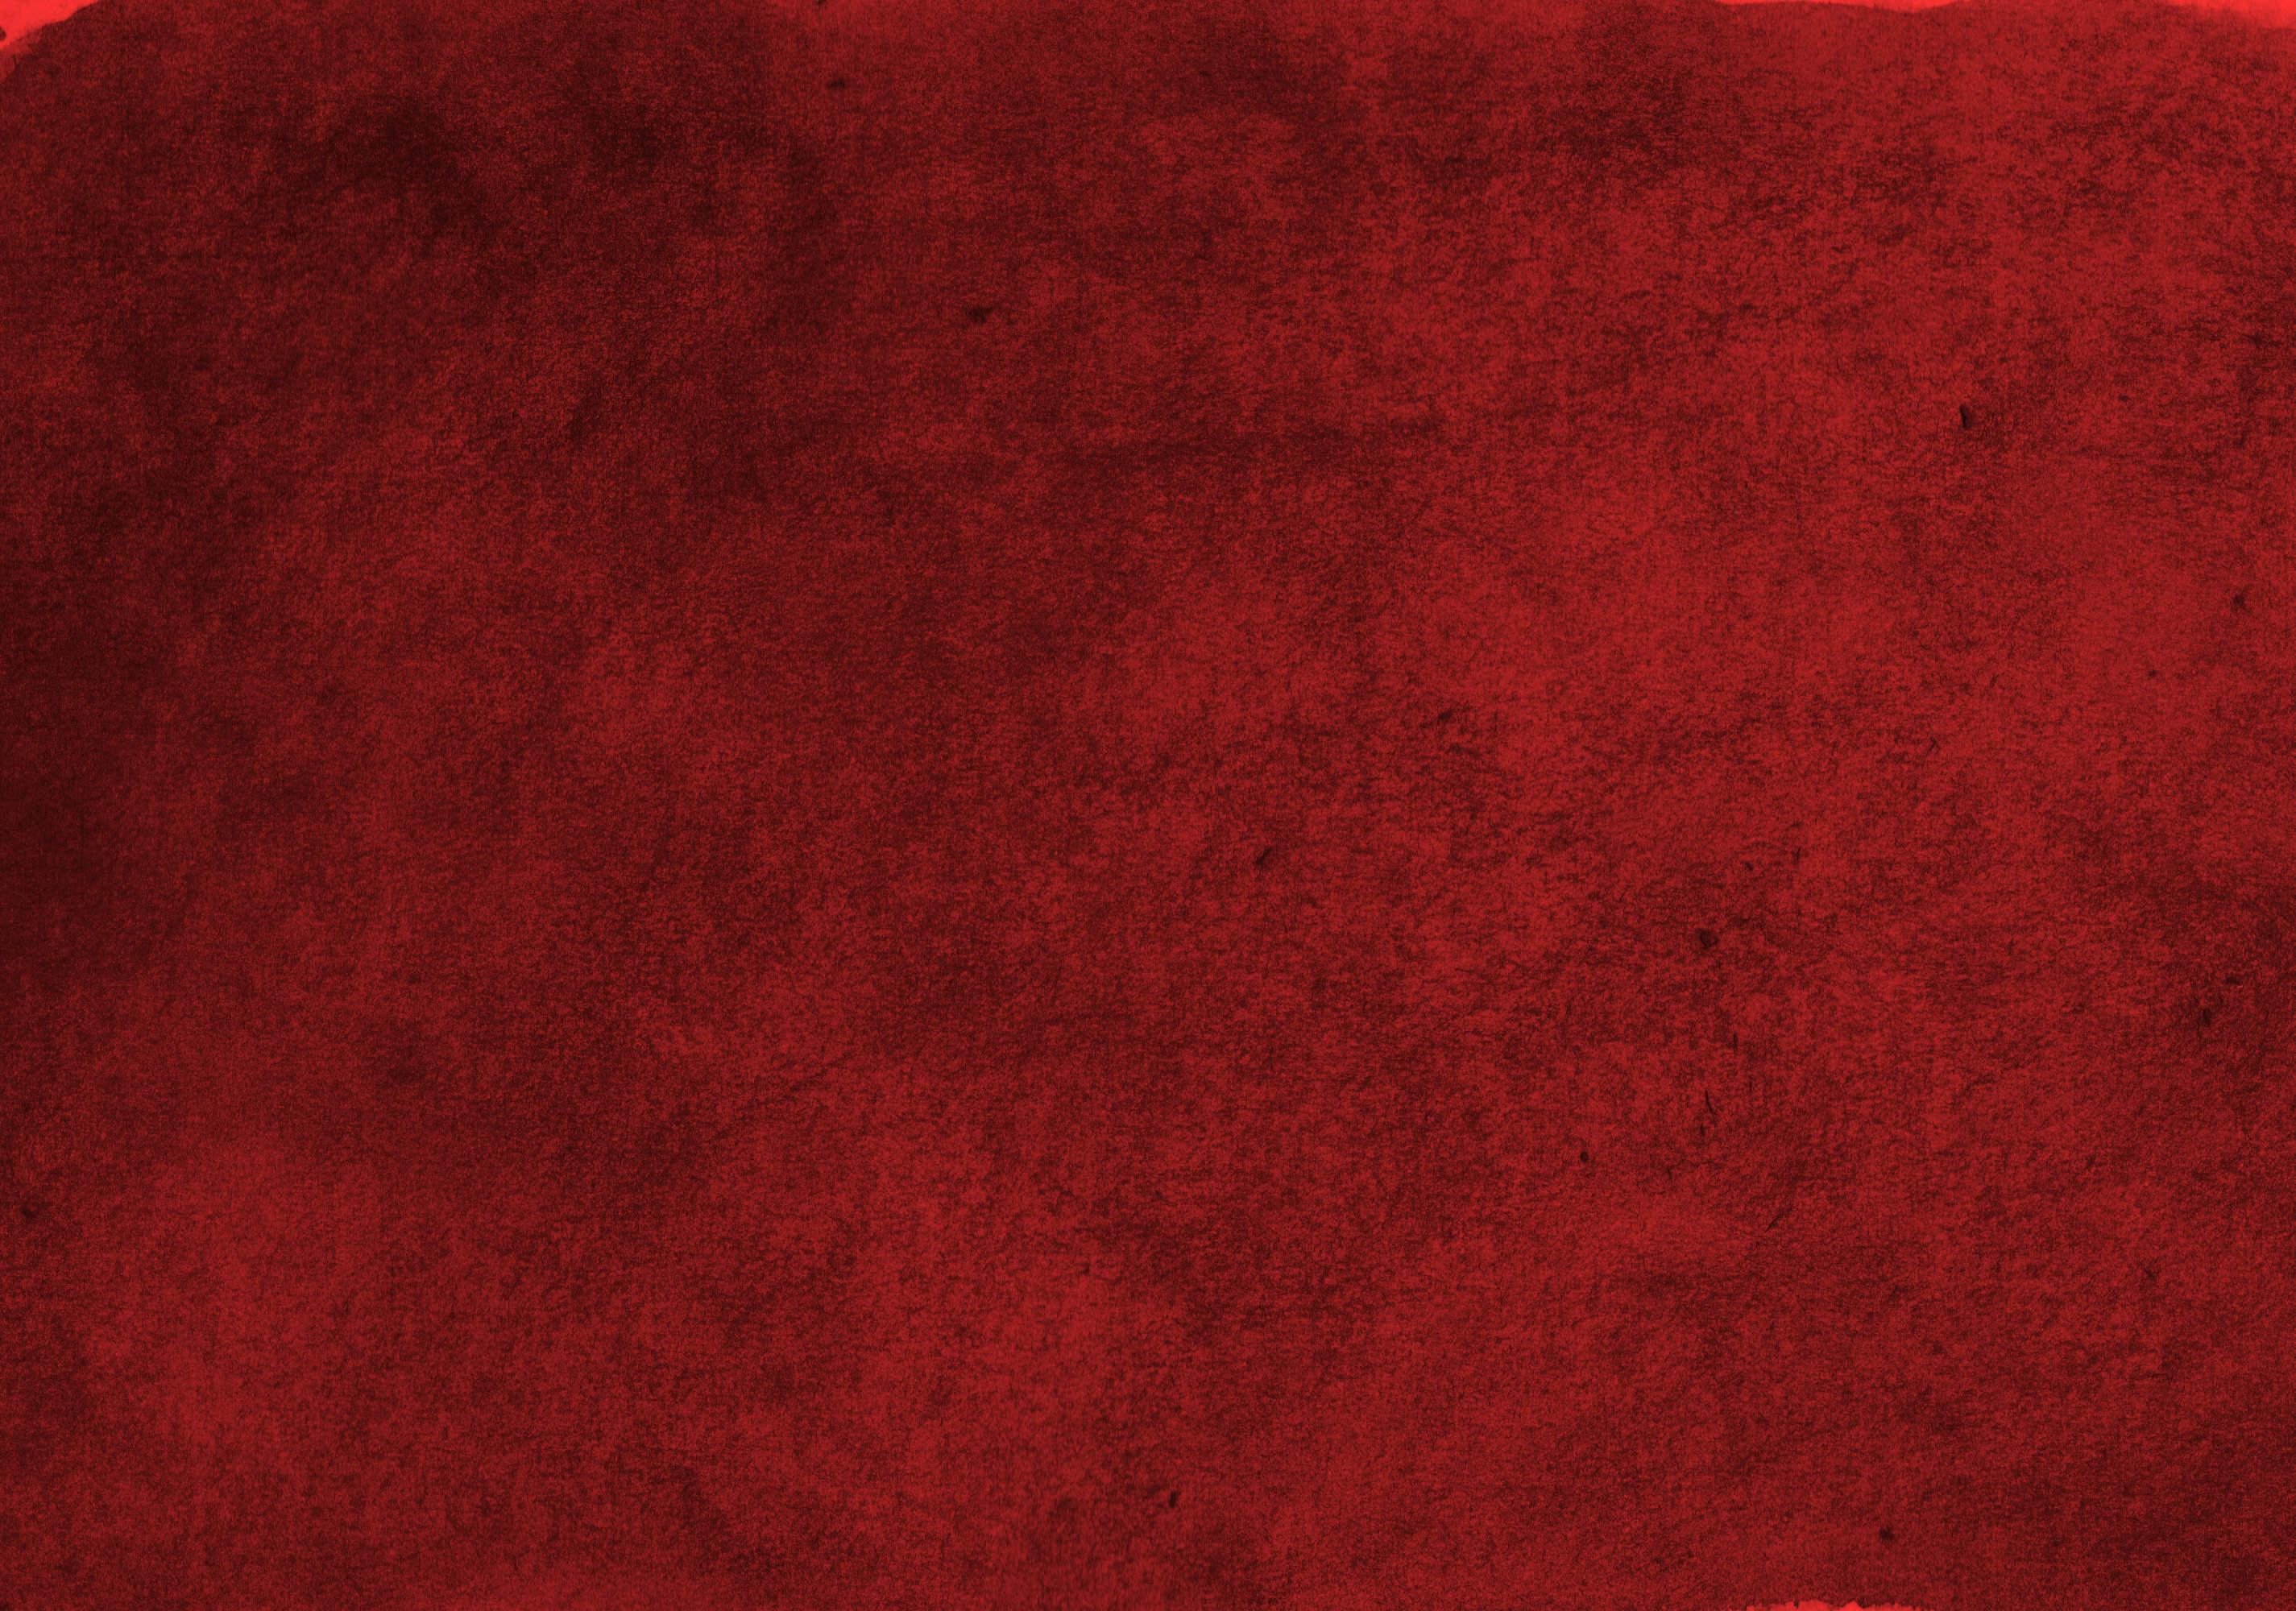 6 Dark Red Watercolor Textures (JPG) | OnlyGFX.com